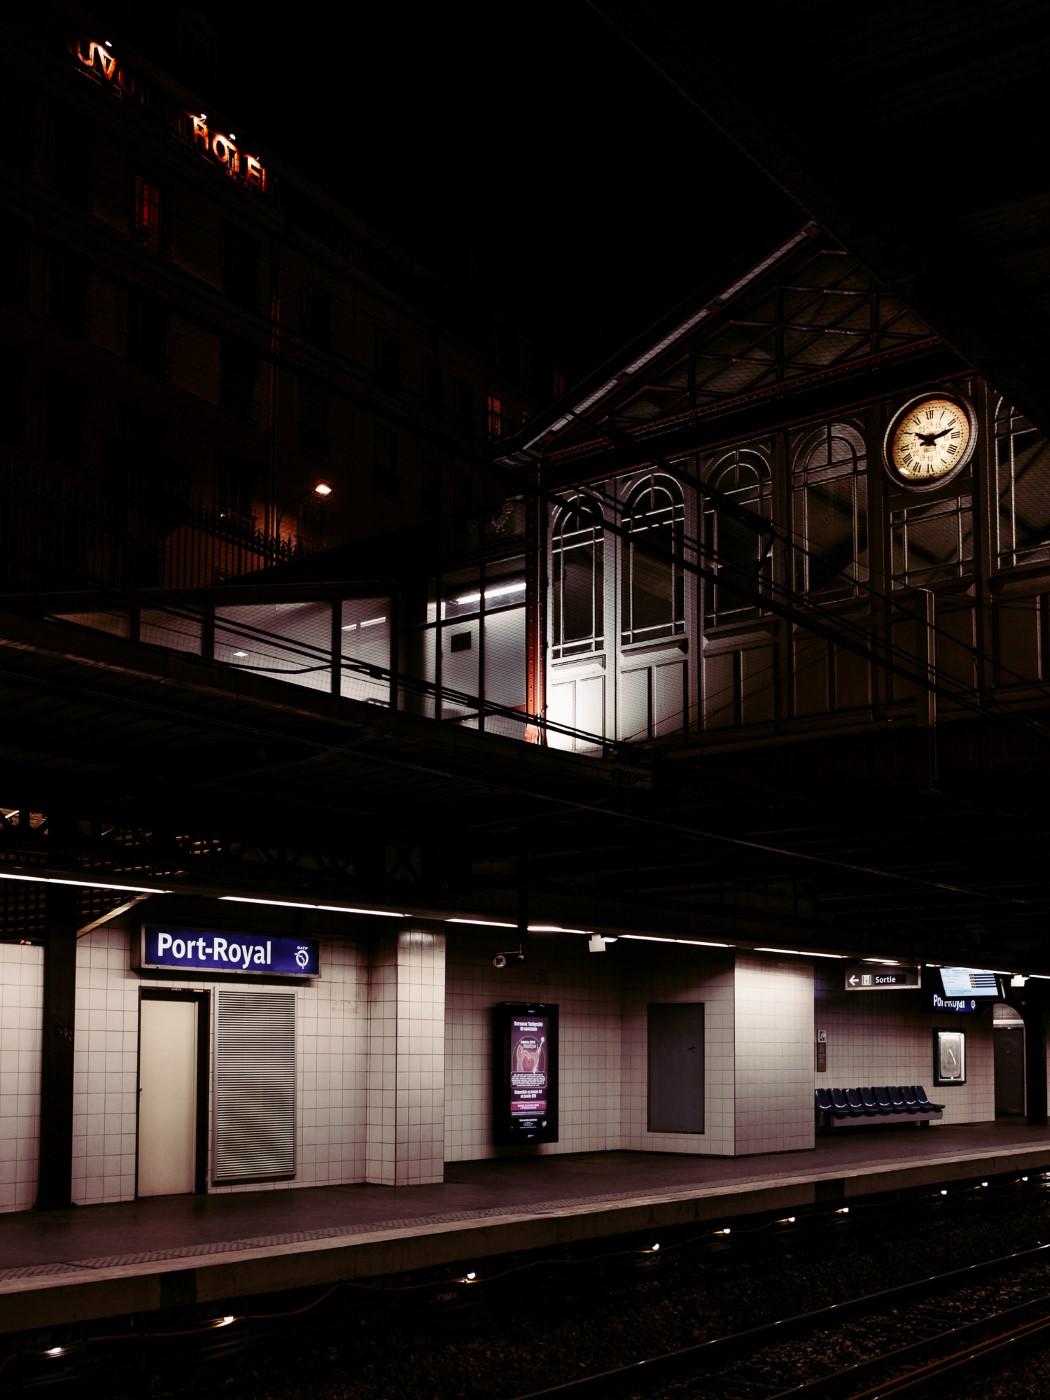 Station metro RER Port Royal